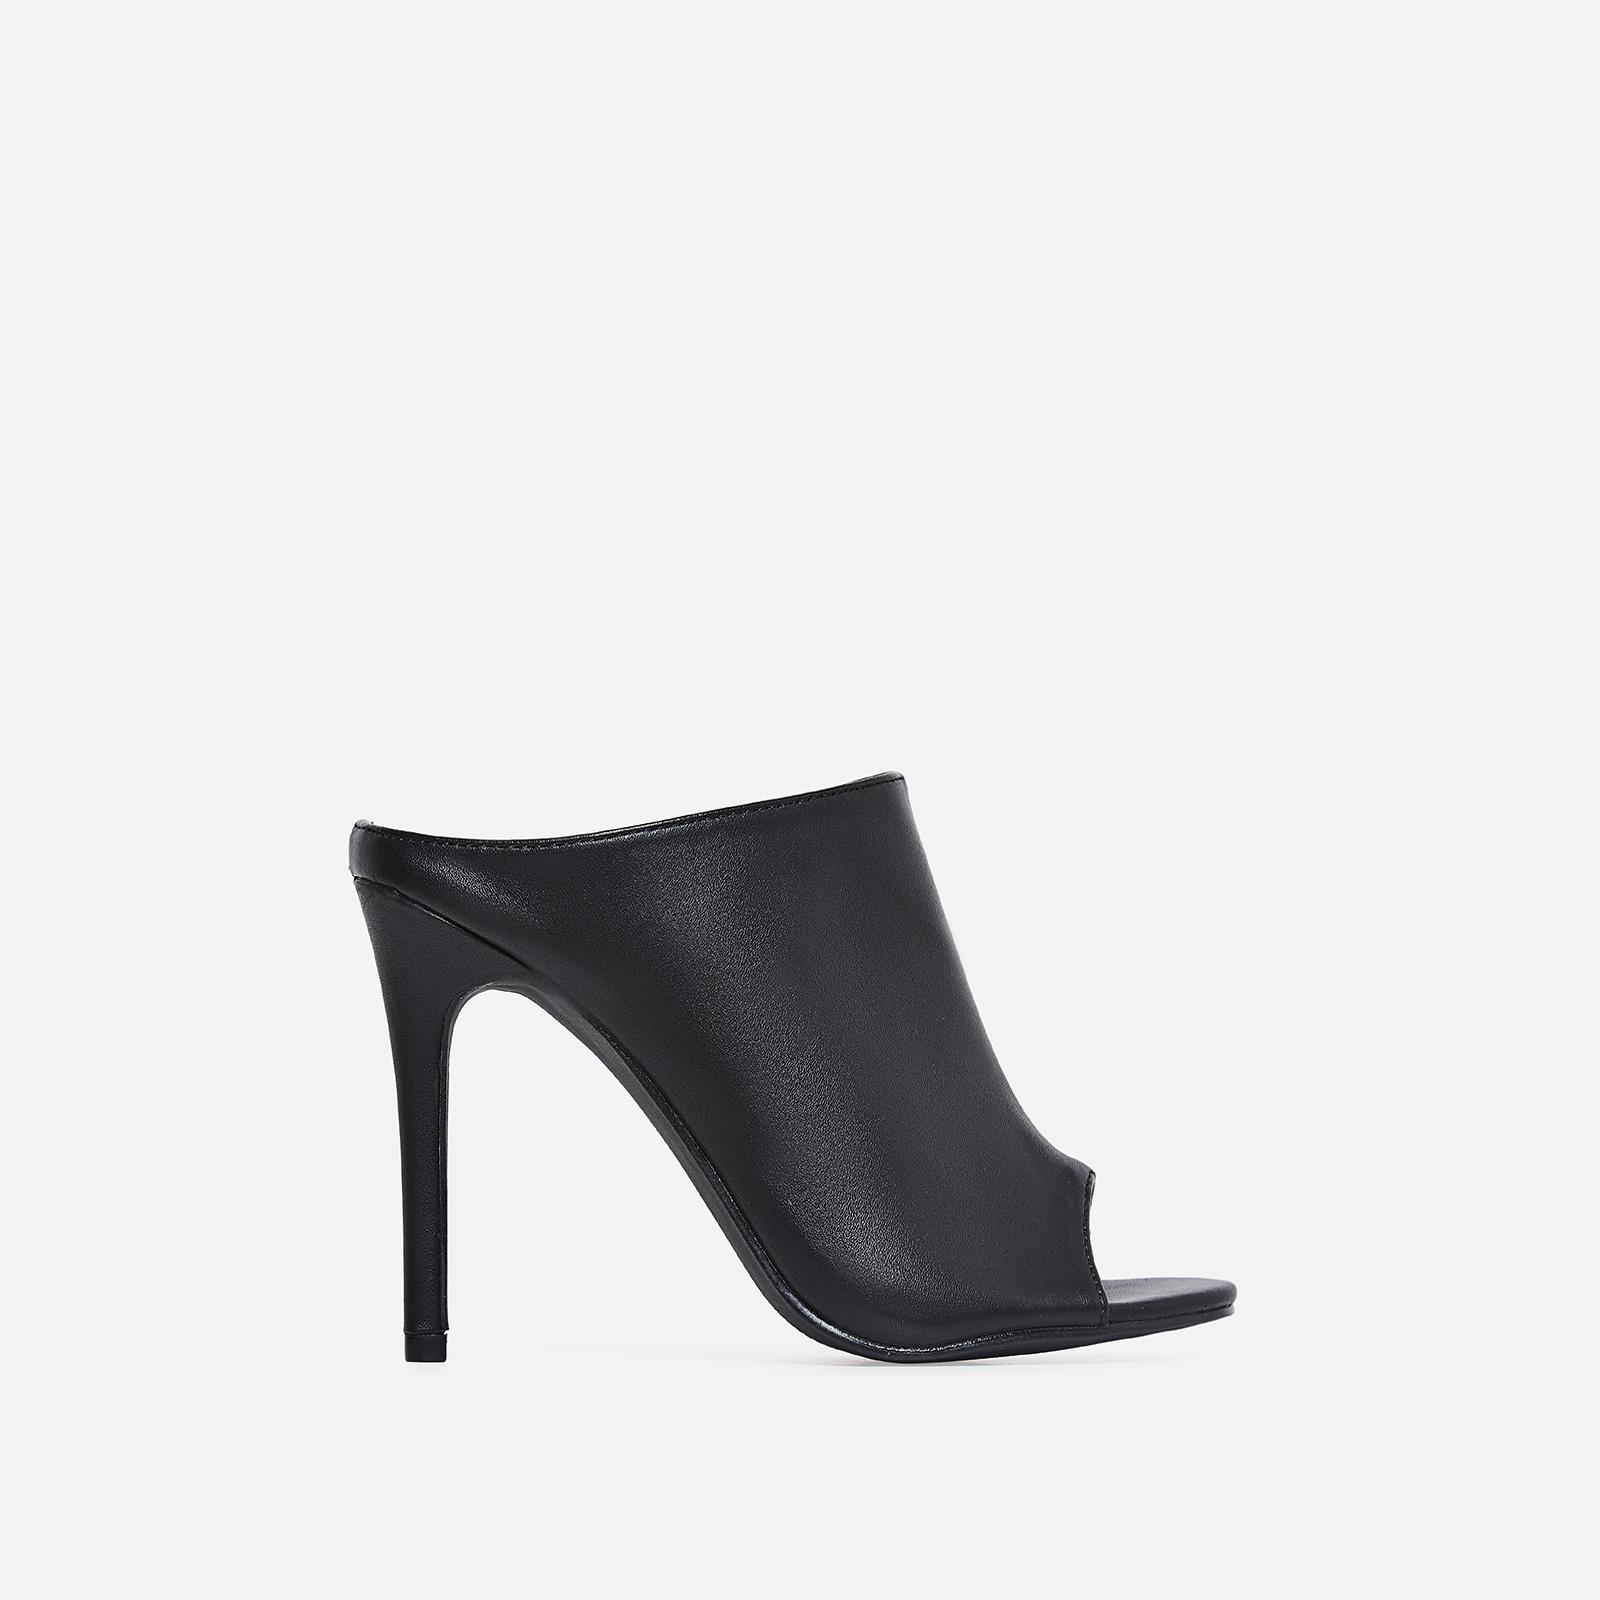 Downtown Peep Toe Mule In Black Faux Leather